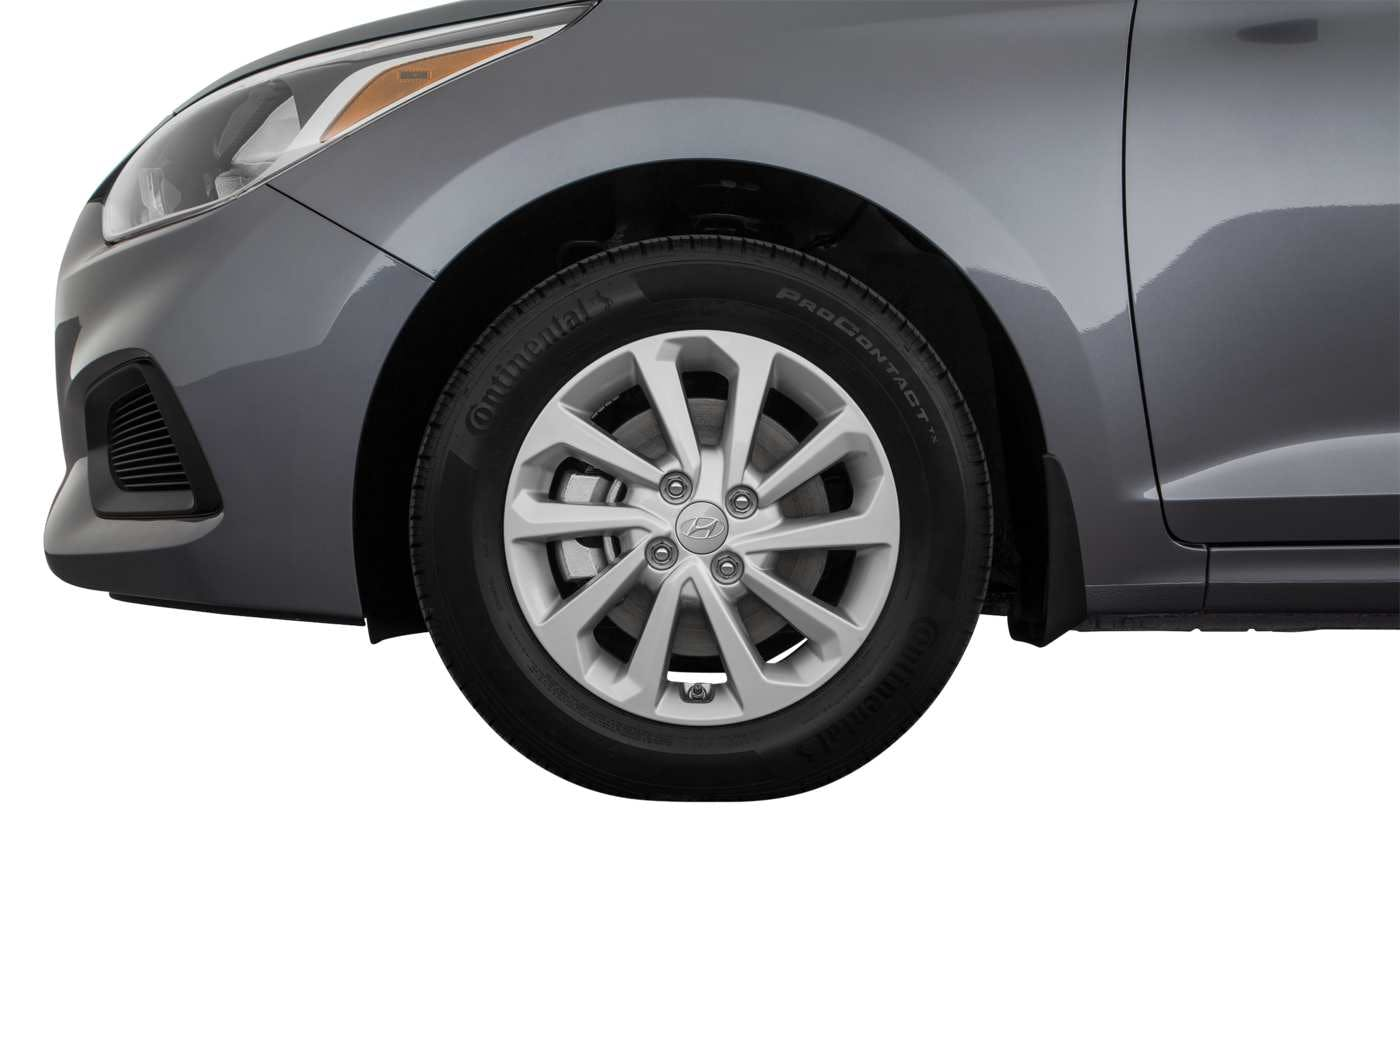 2019 Hyundai Accent Front Wheel